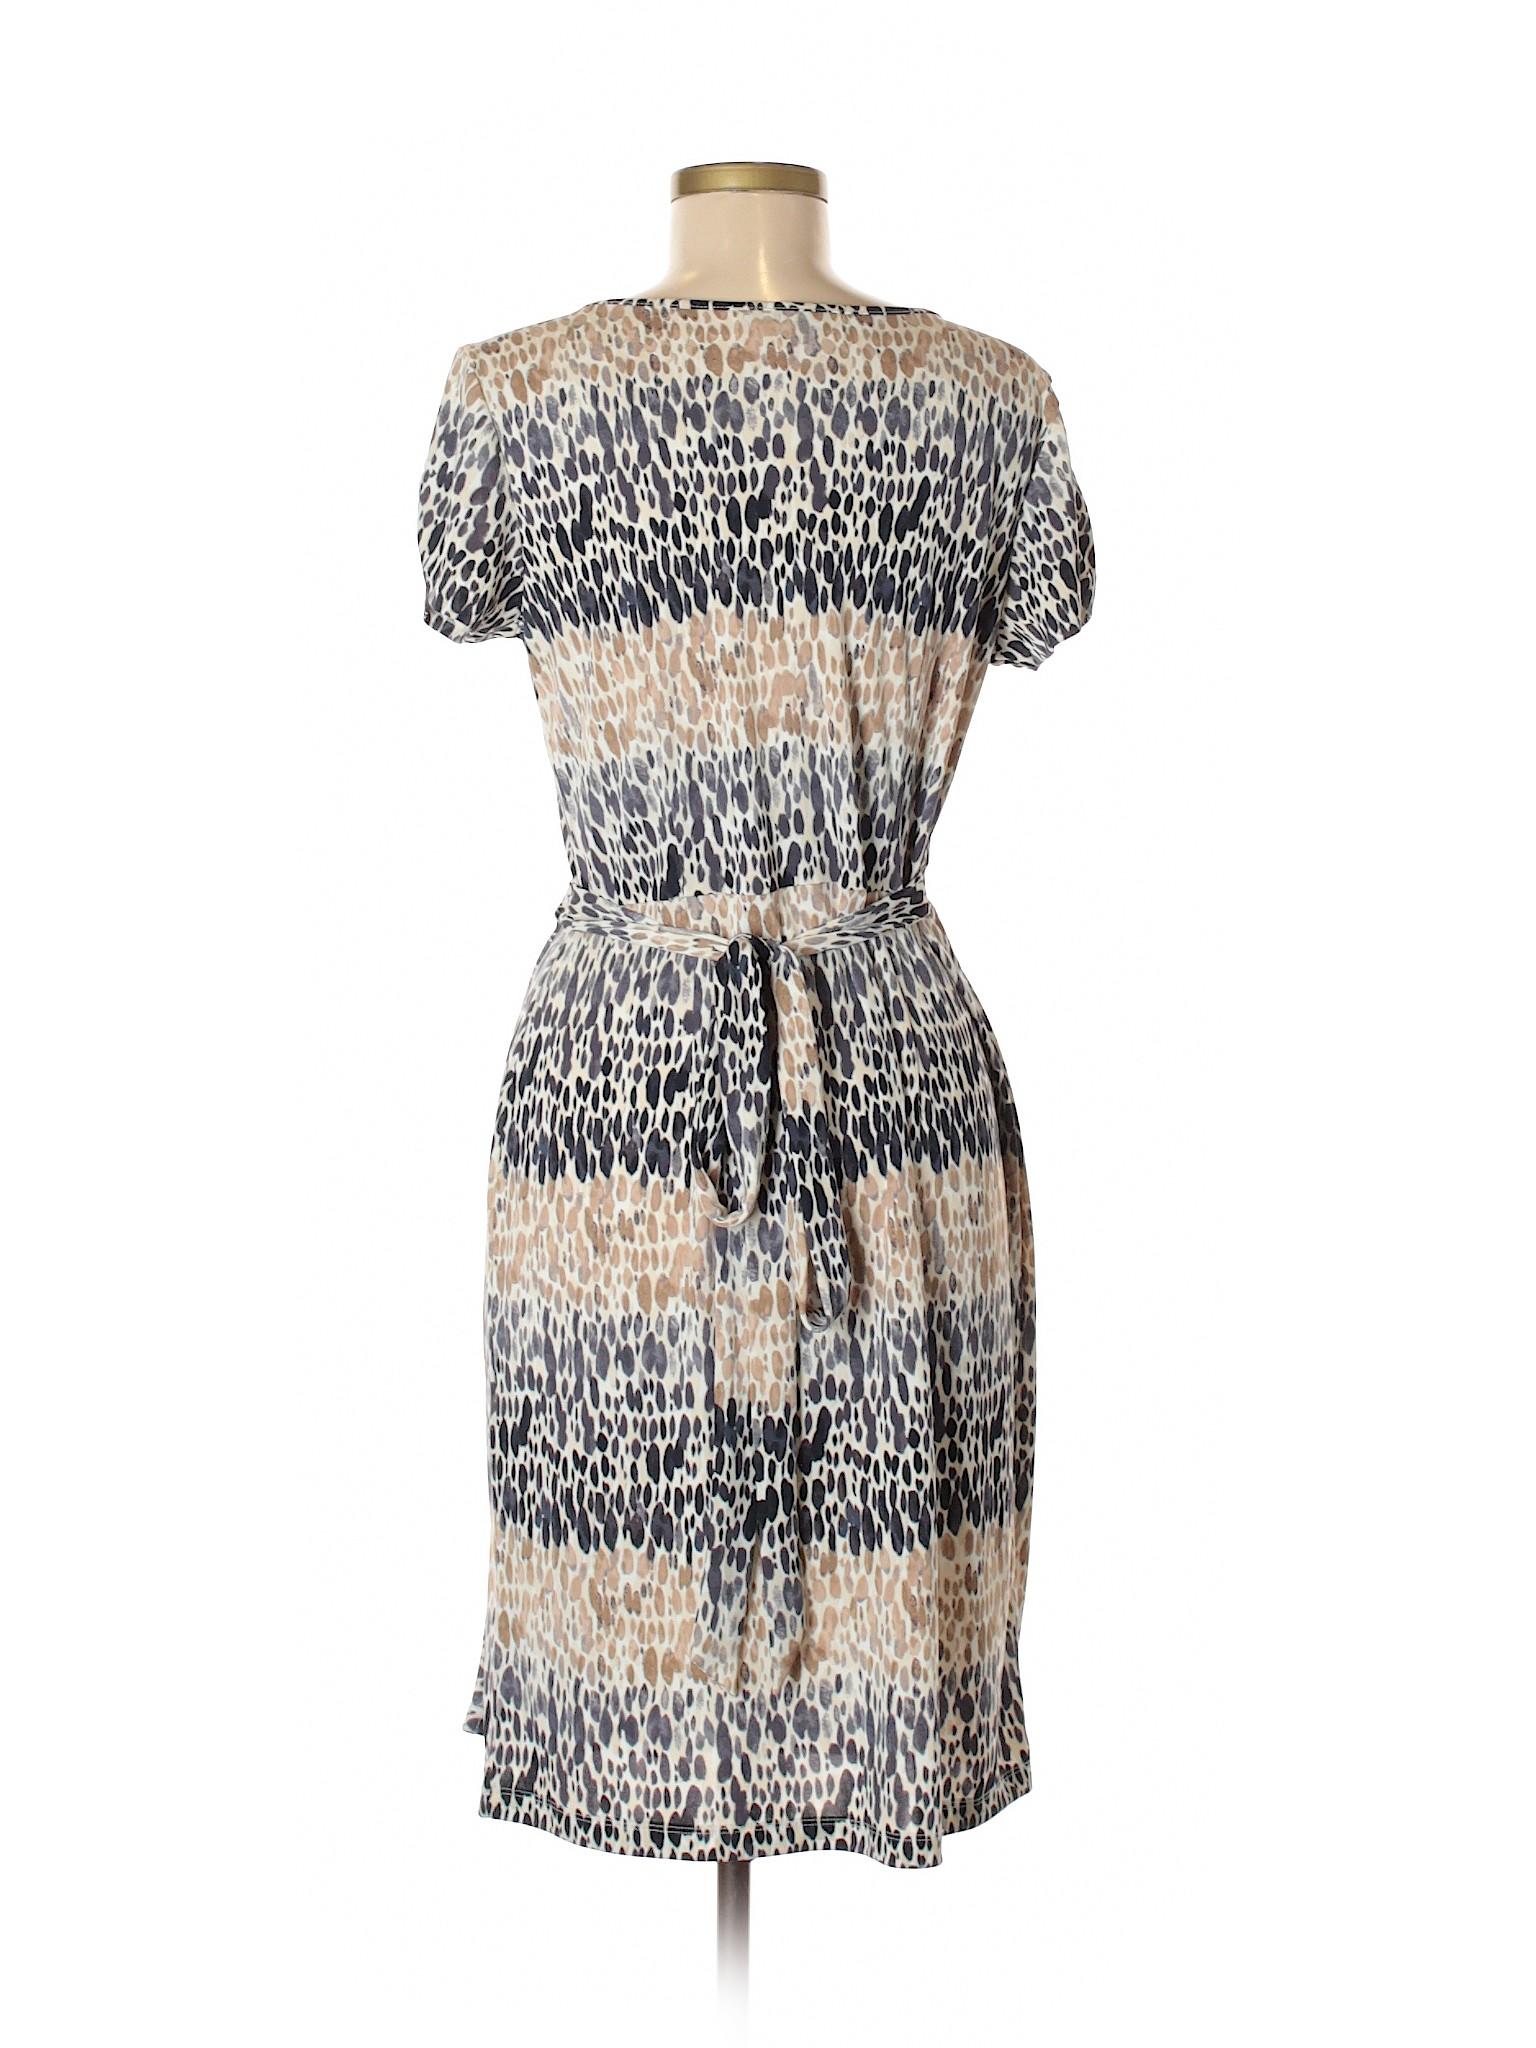 Dress Taylor LOFT Casual Ann Selling O7xIYq17